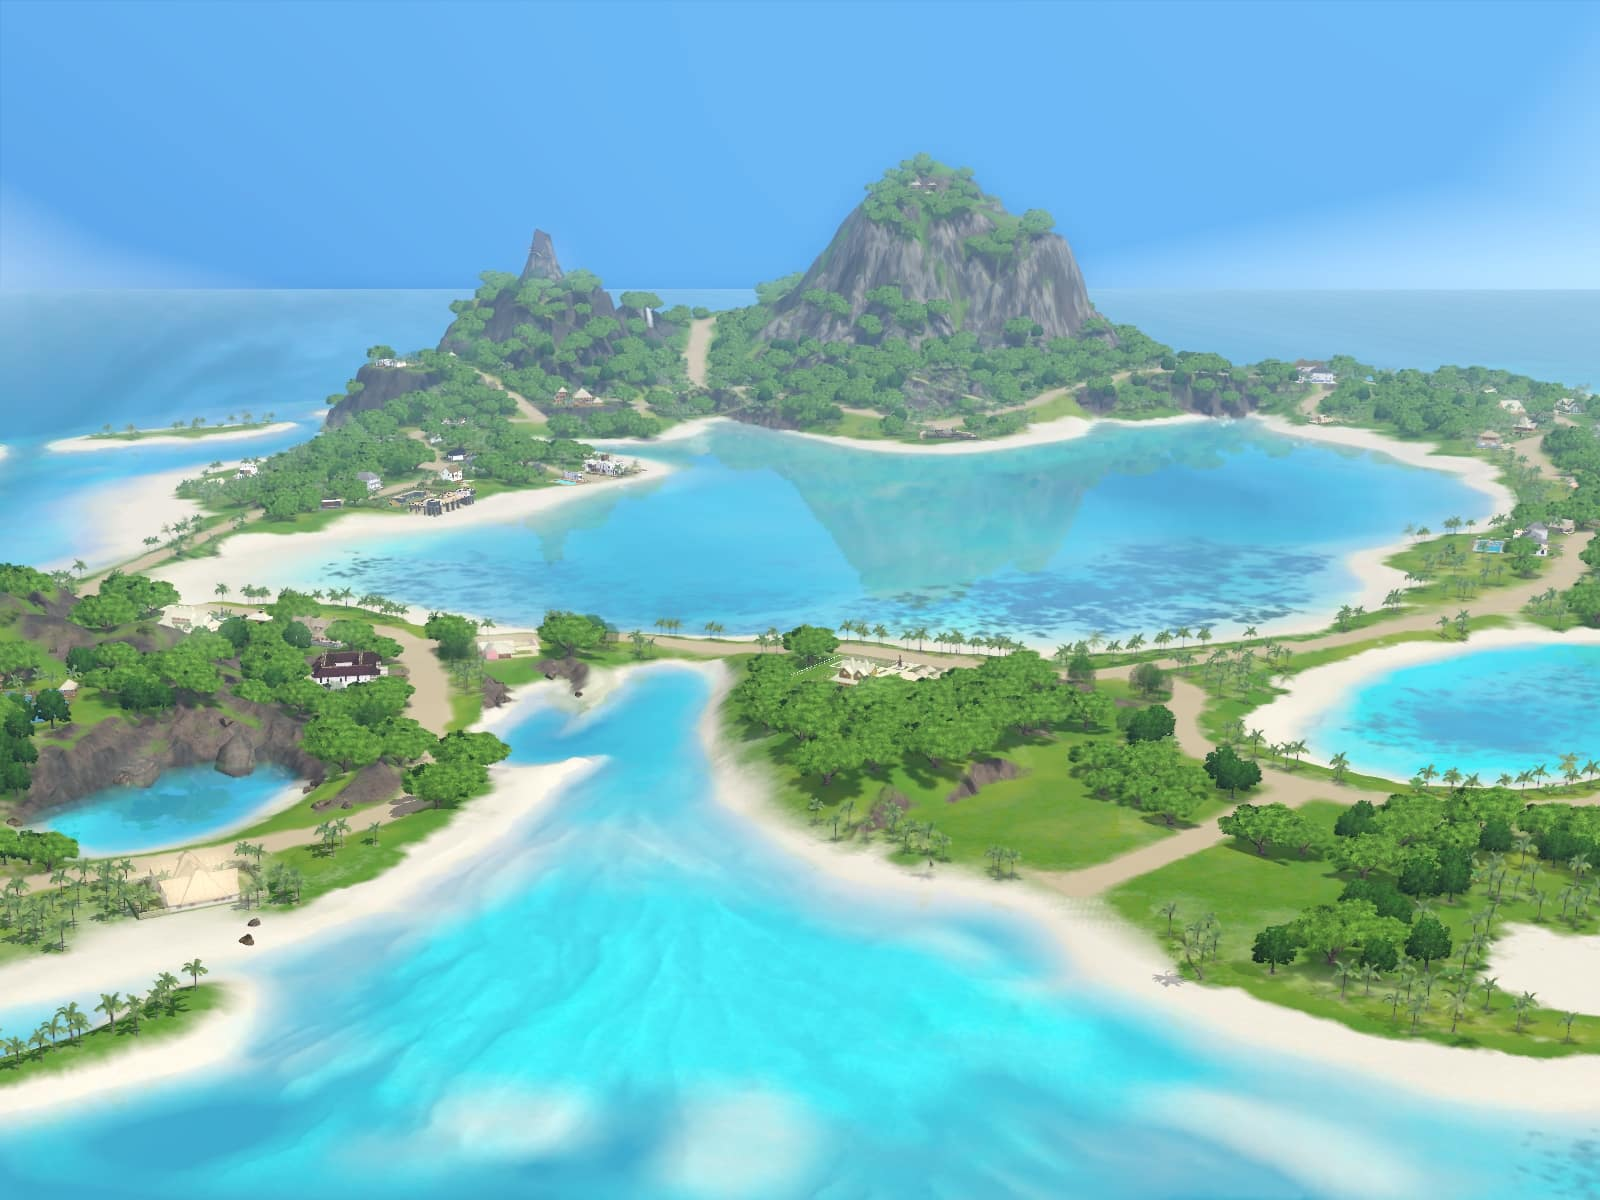 The Sims 3 Sunlit Tides Assets